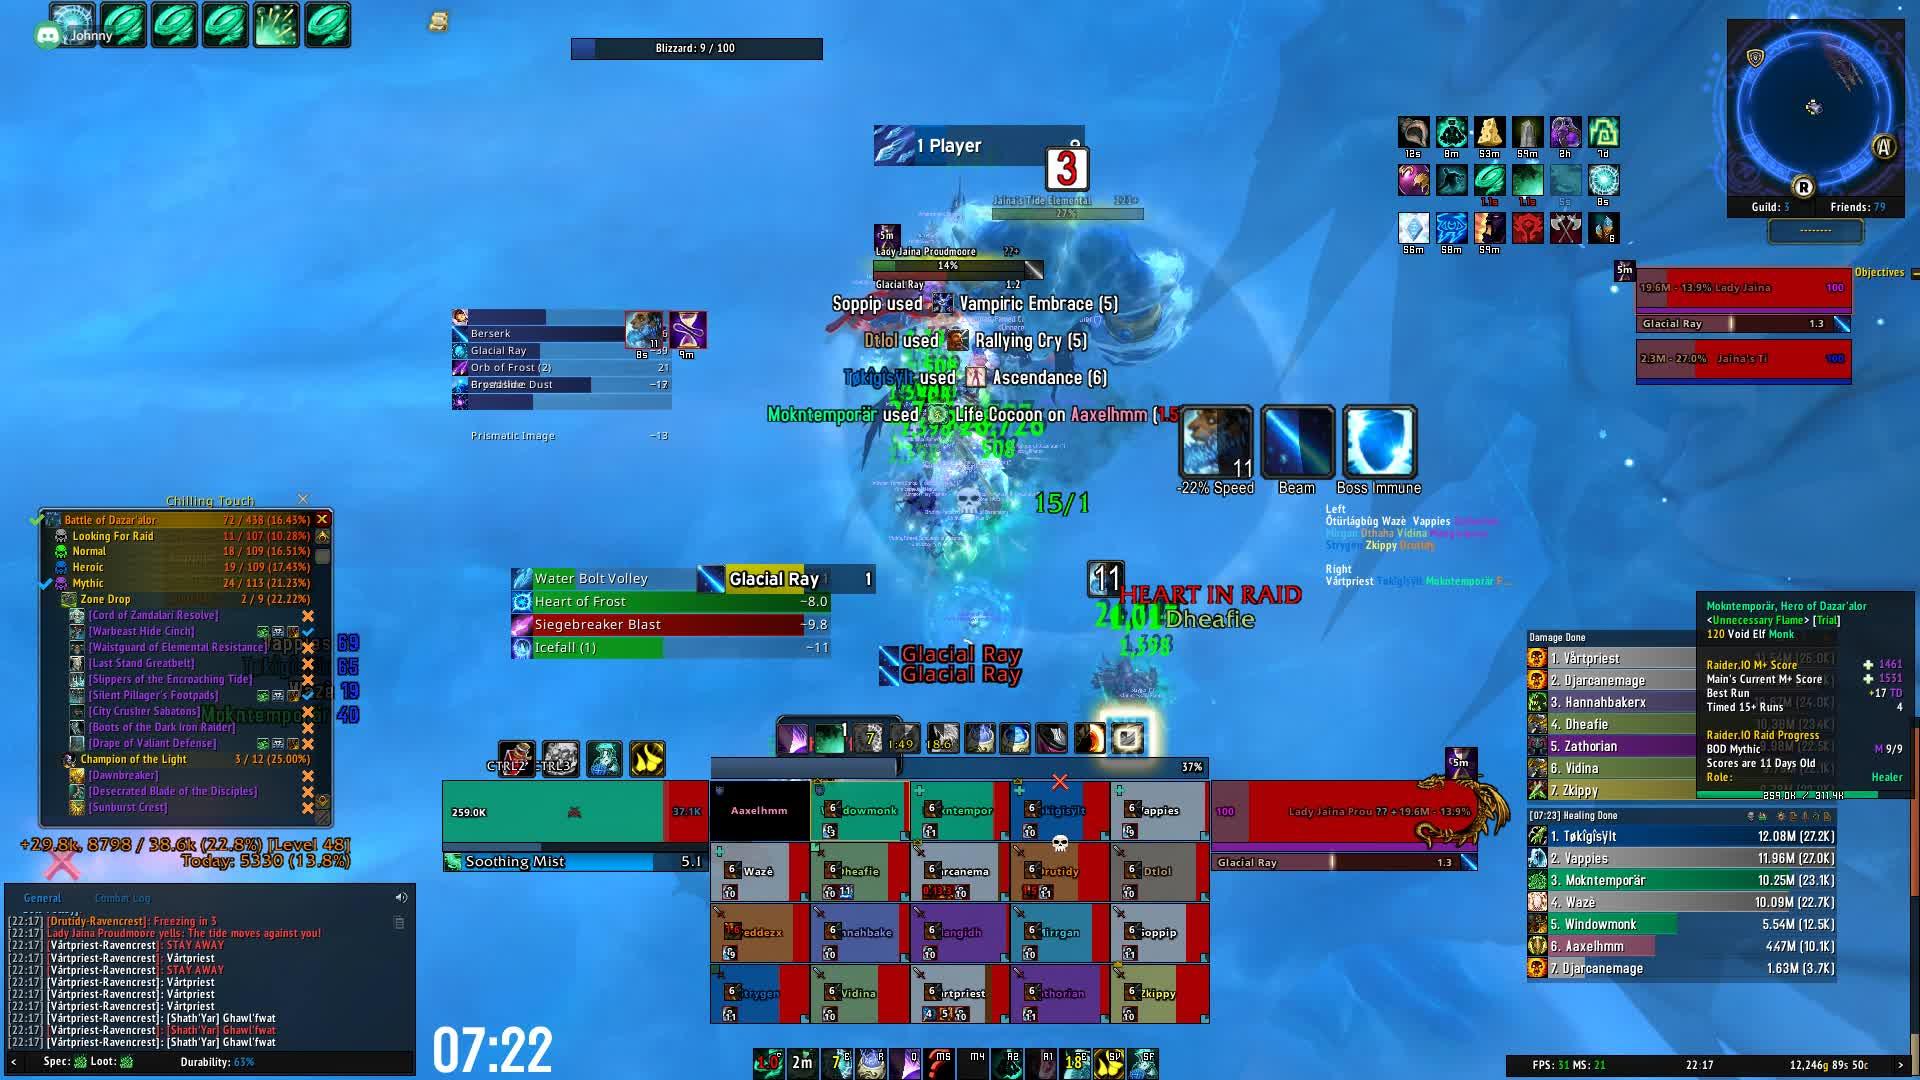 worldofwarcraft, World Of Warcraft 2019.04.17 - 22.18.05.05.DVR GIFs